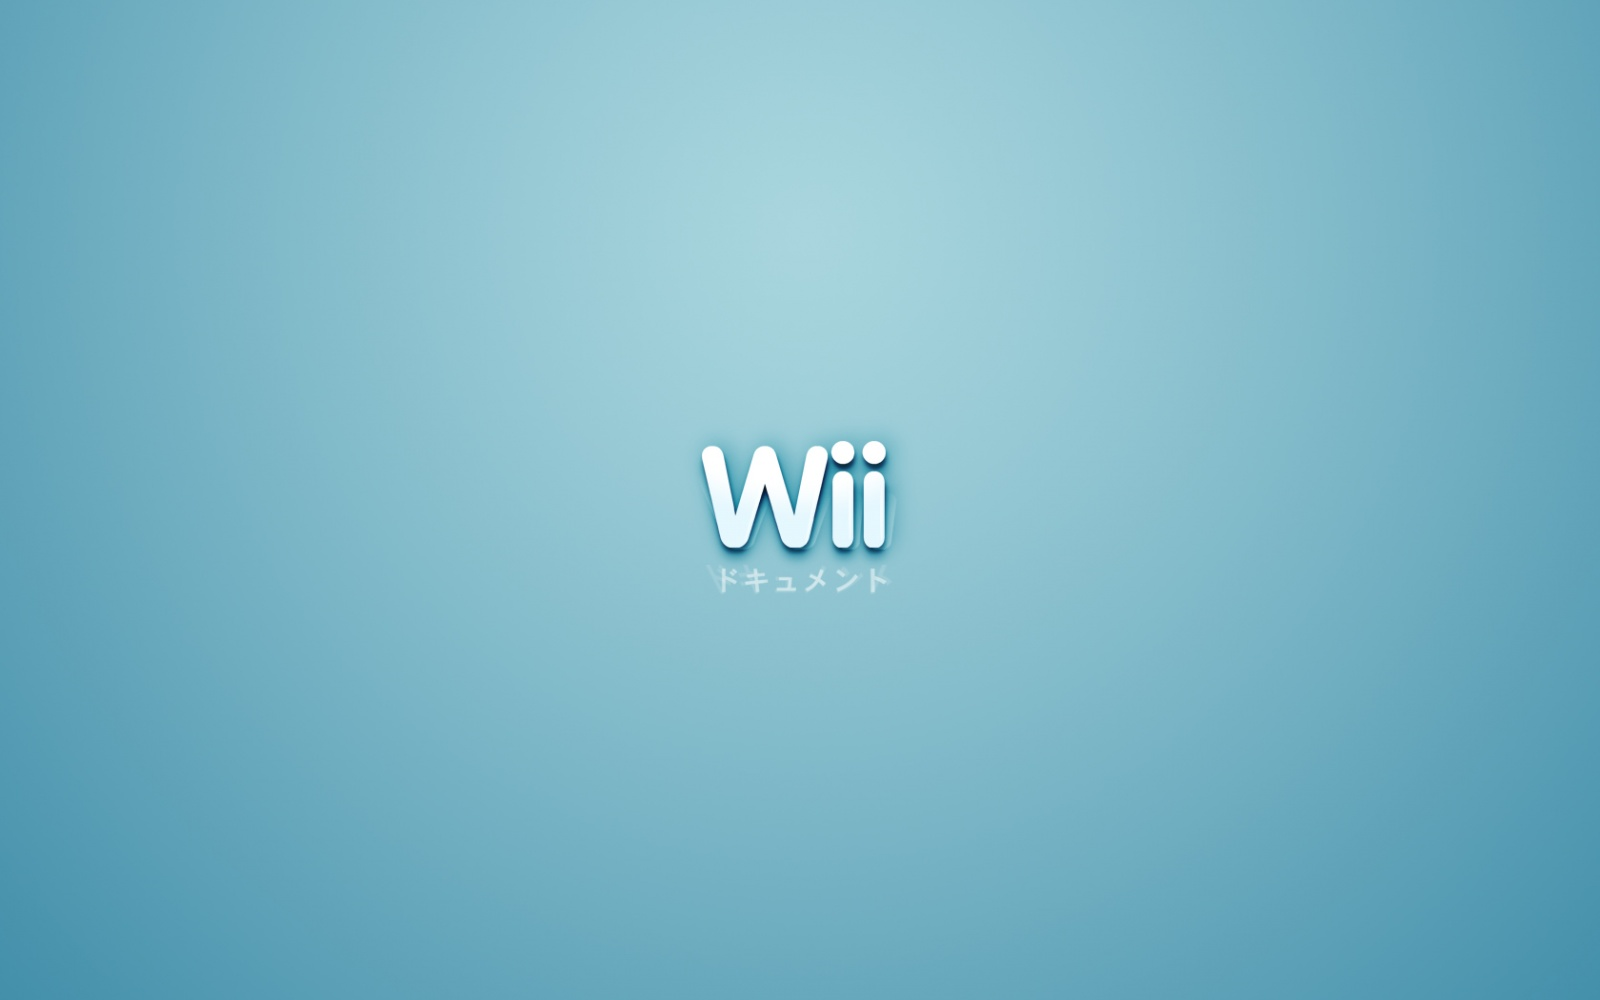 HD Desktop Wallpaper Nintendo Wii Wallpapers 9 Blue Wii Wallpaper 1600 1600x1000